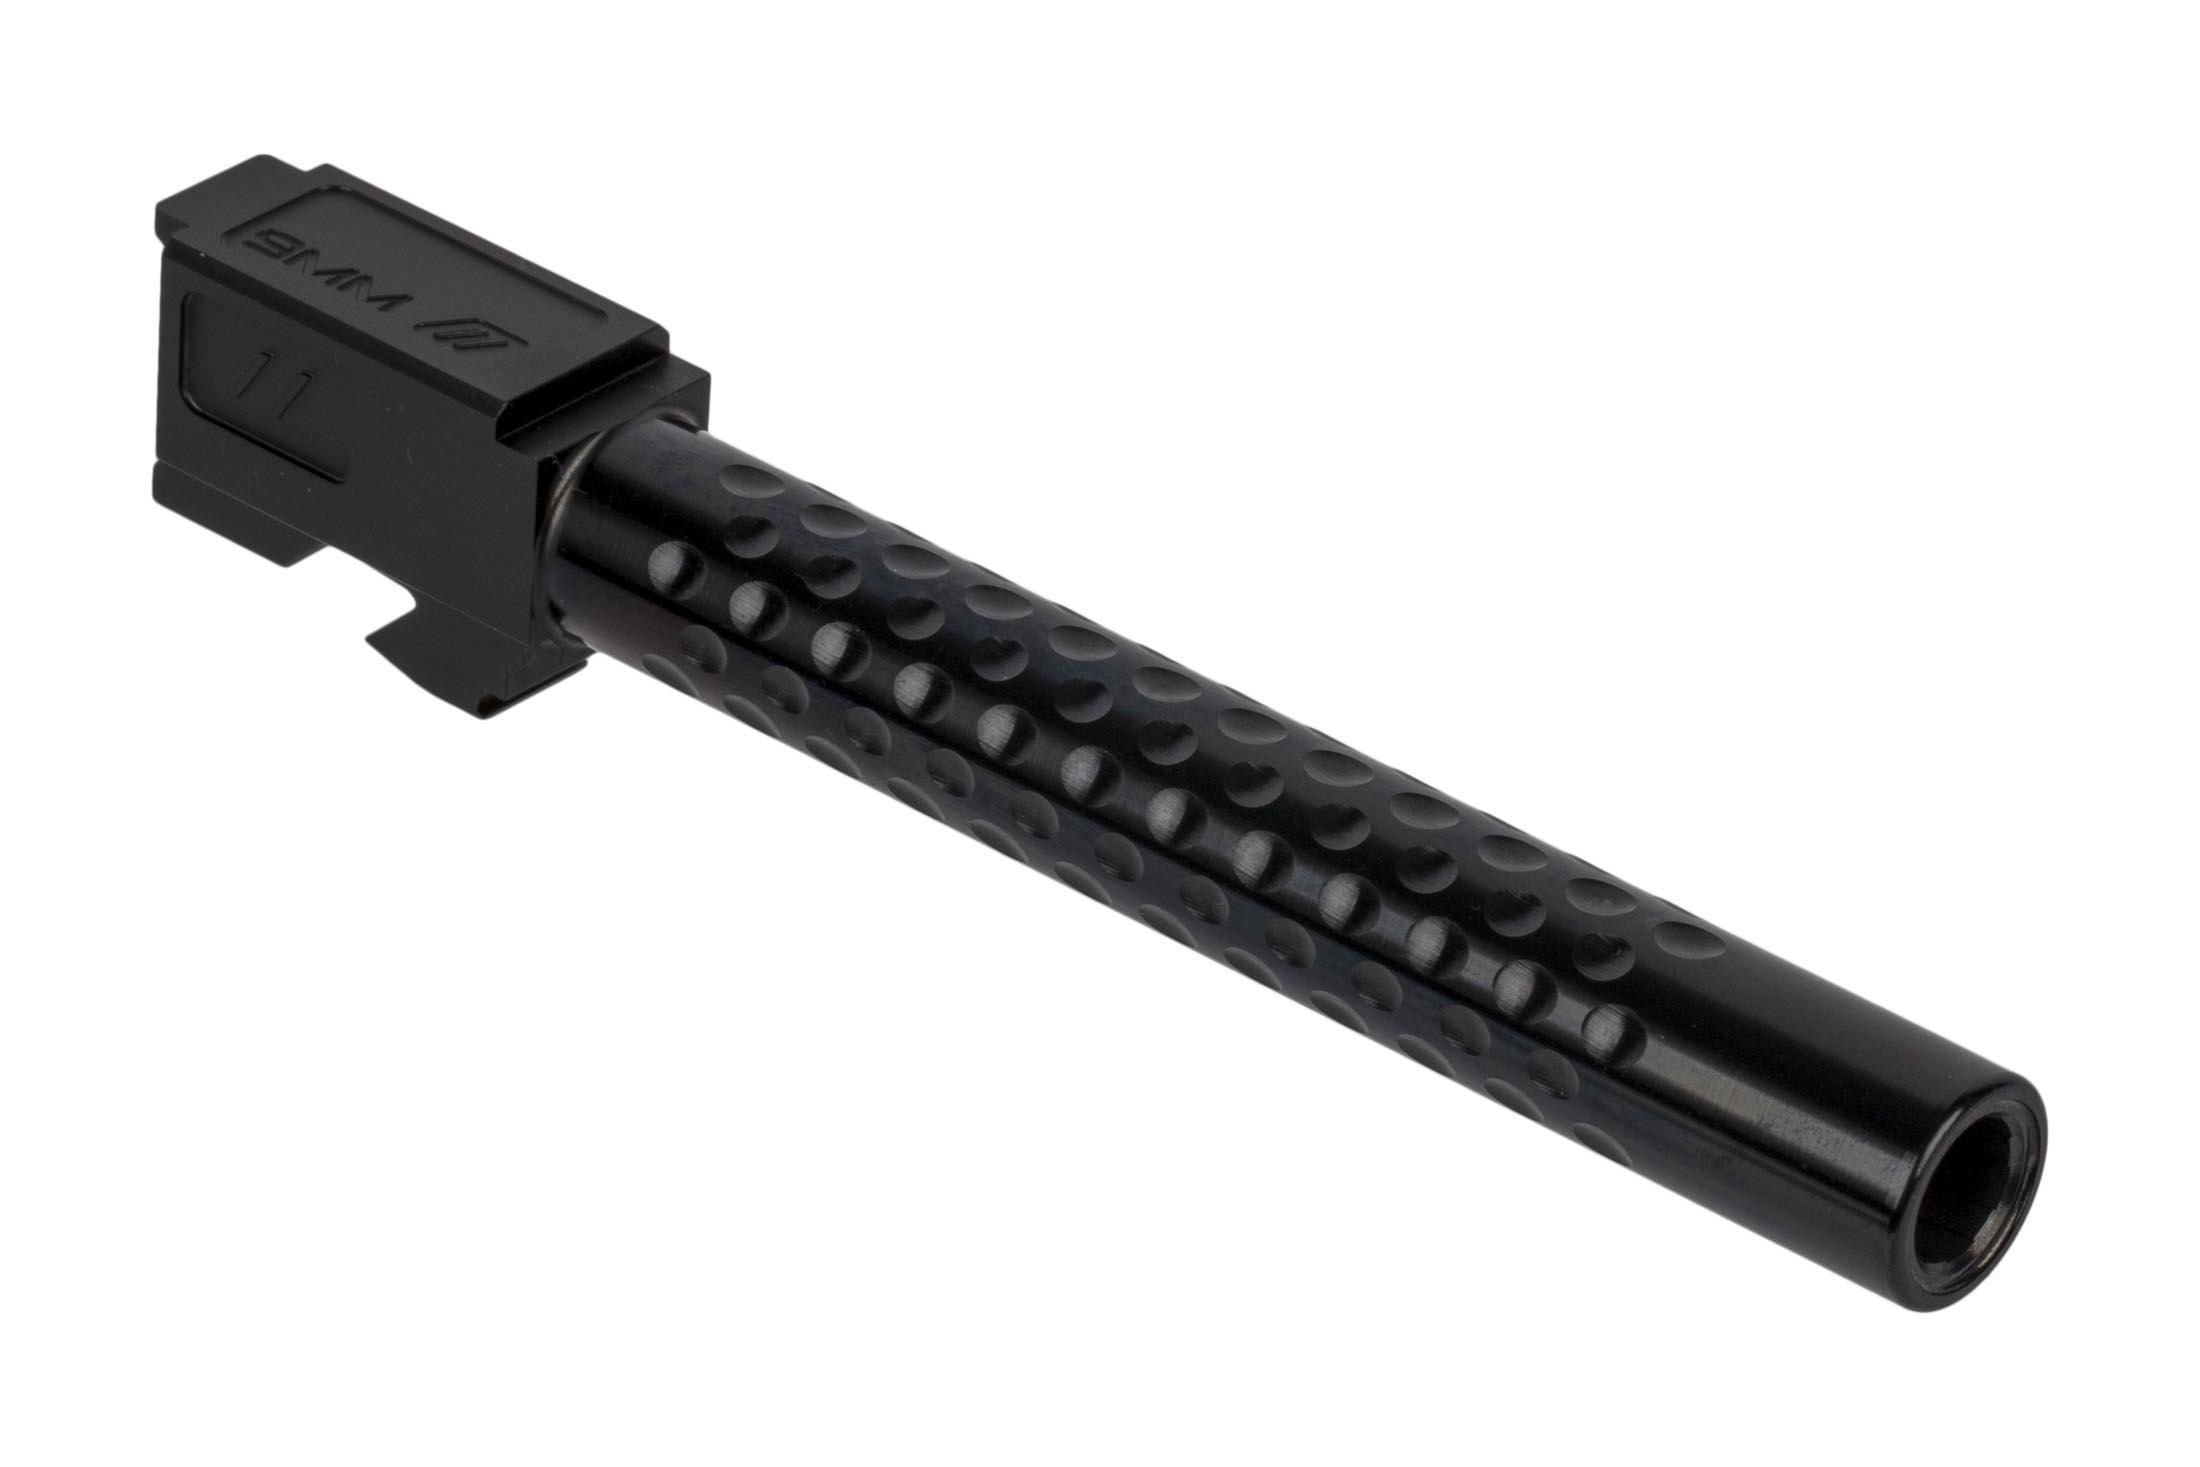 ZEV TECH GLOCK 43 TRIGGER REVIEW - Zev Technologies Glock 34